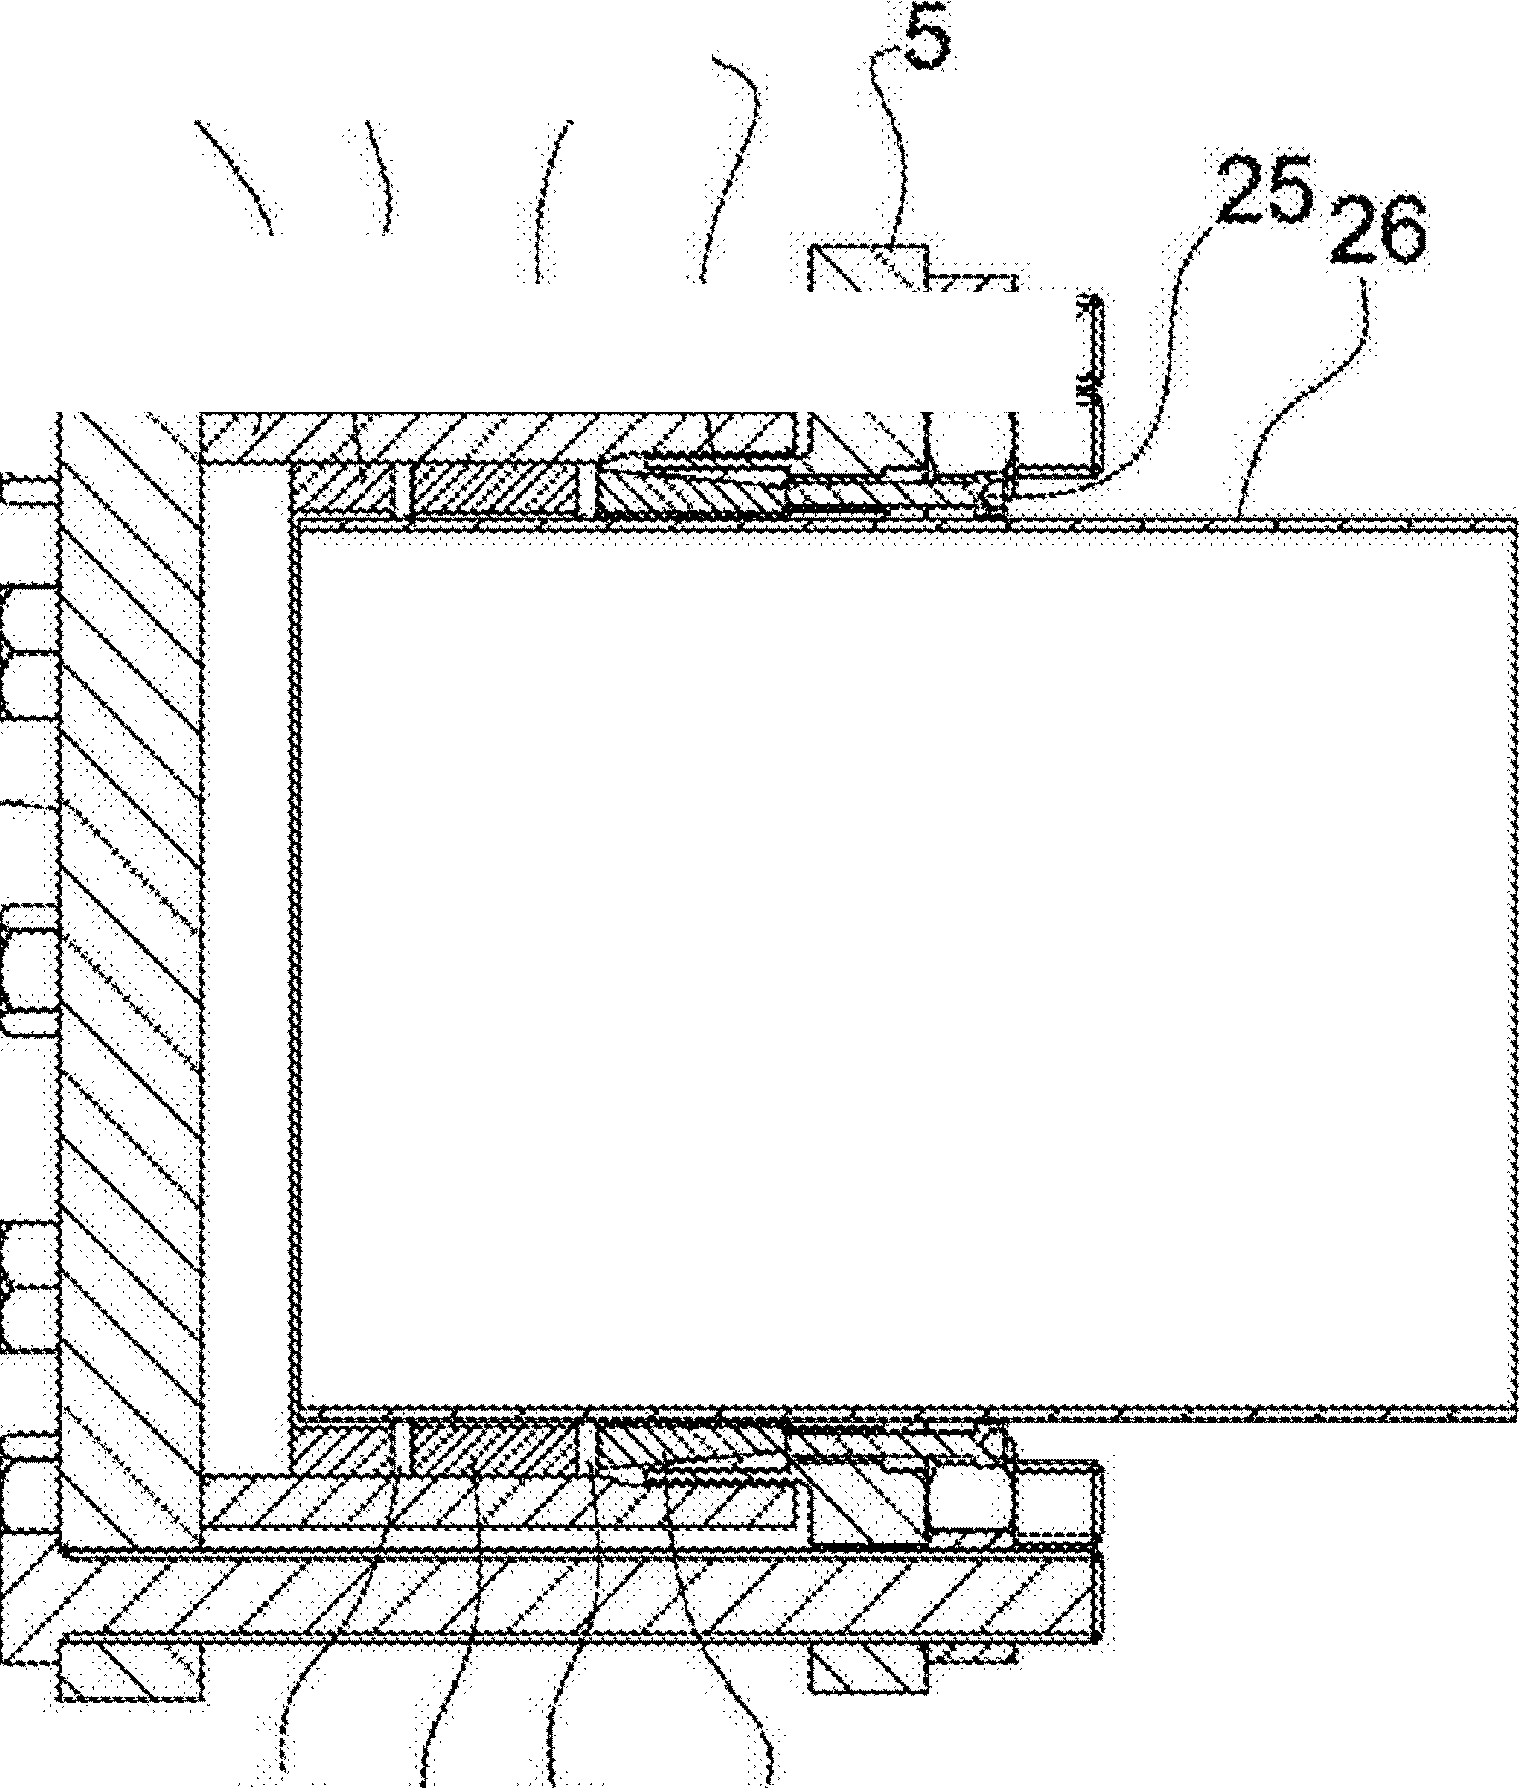 Figure GB2555219A_D0001